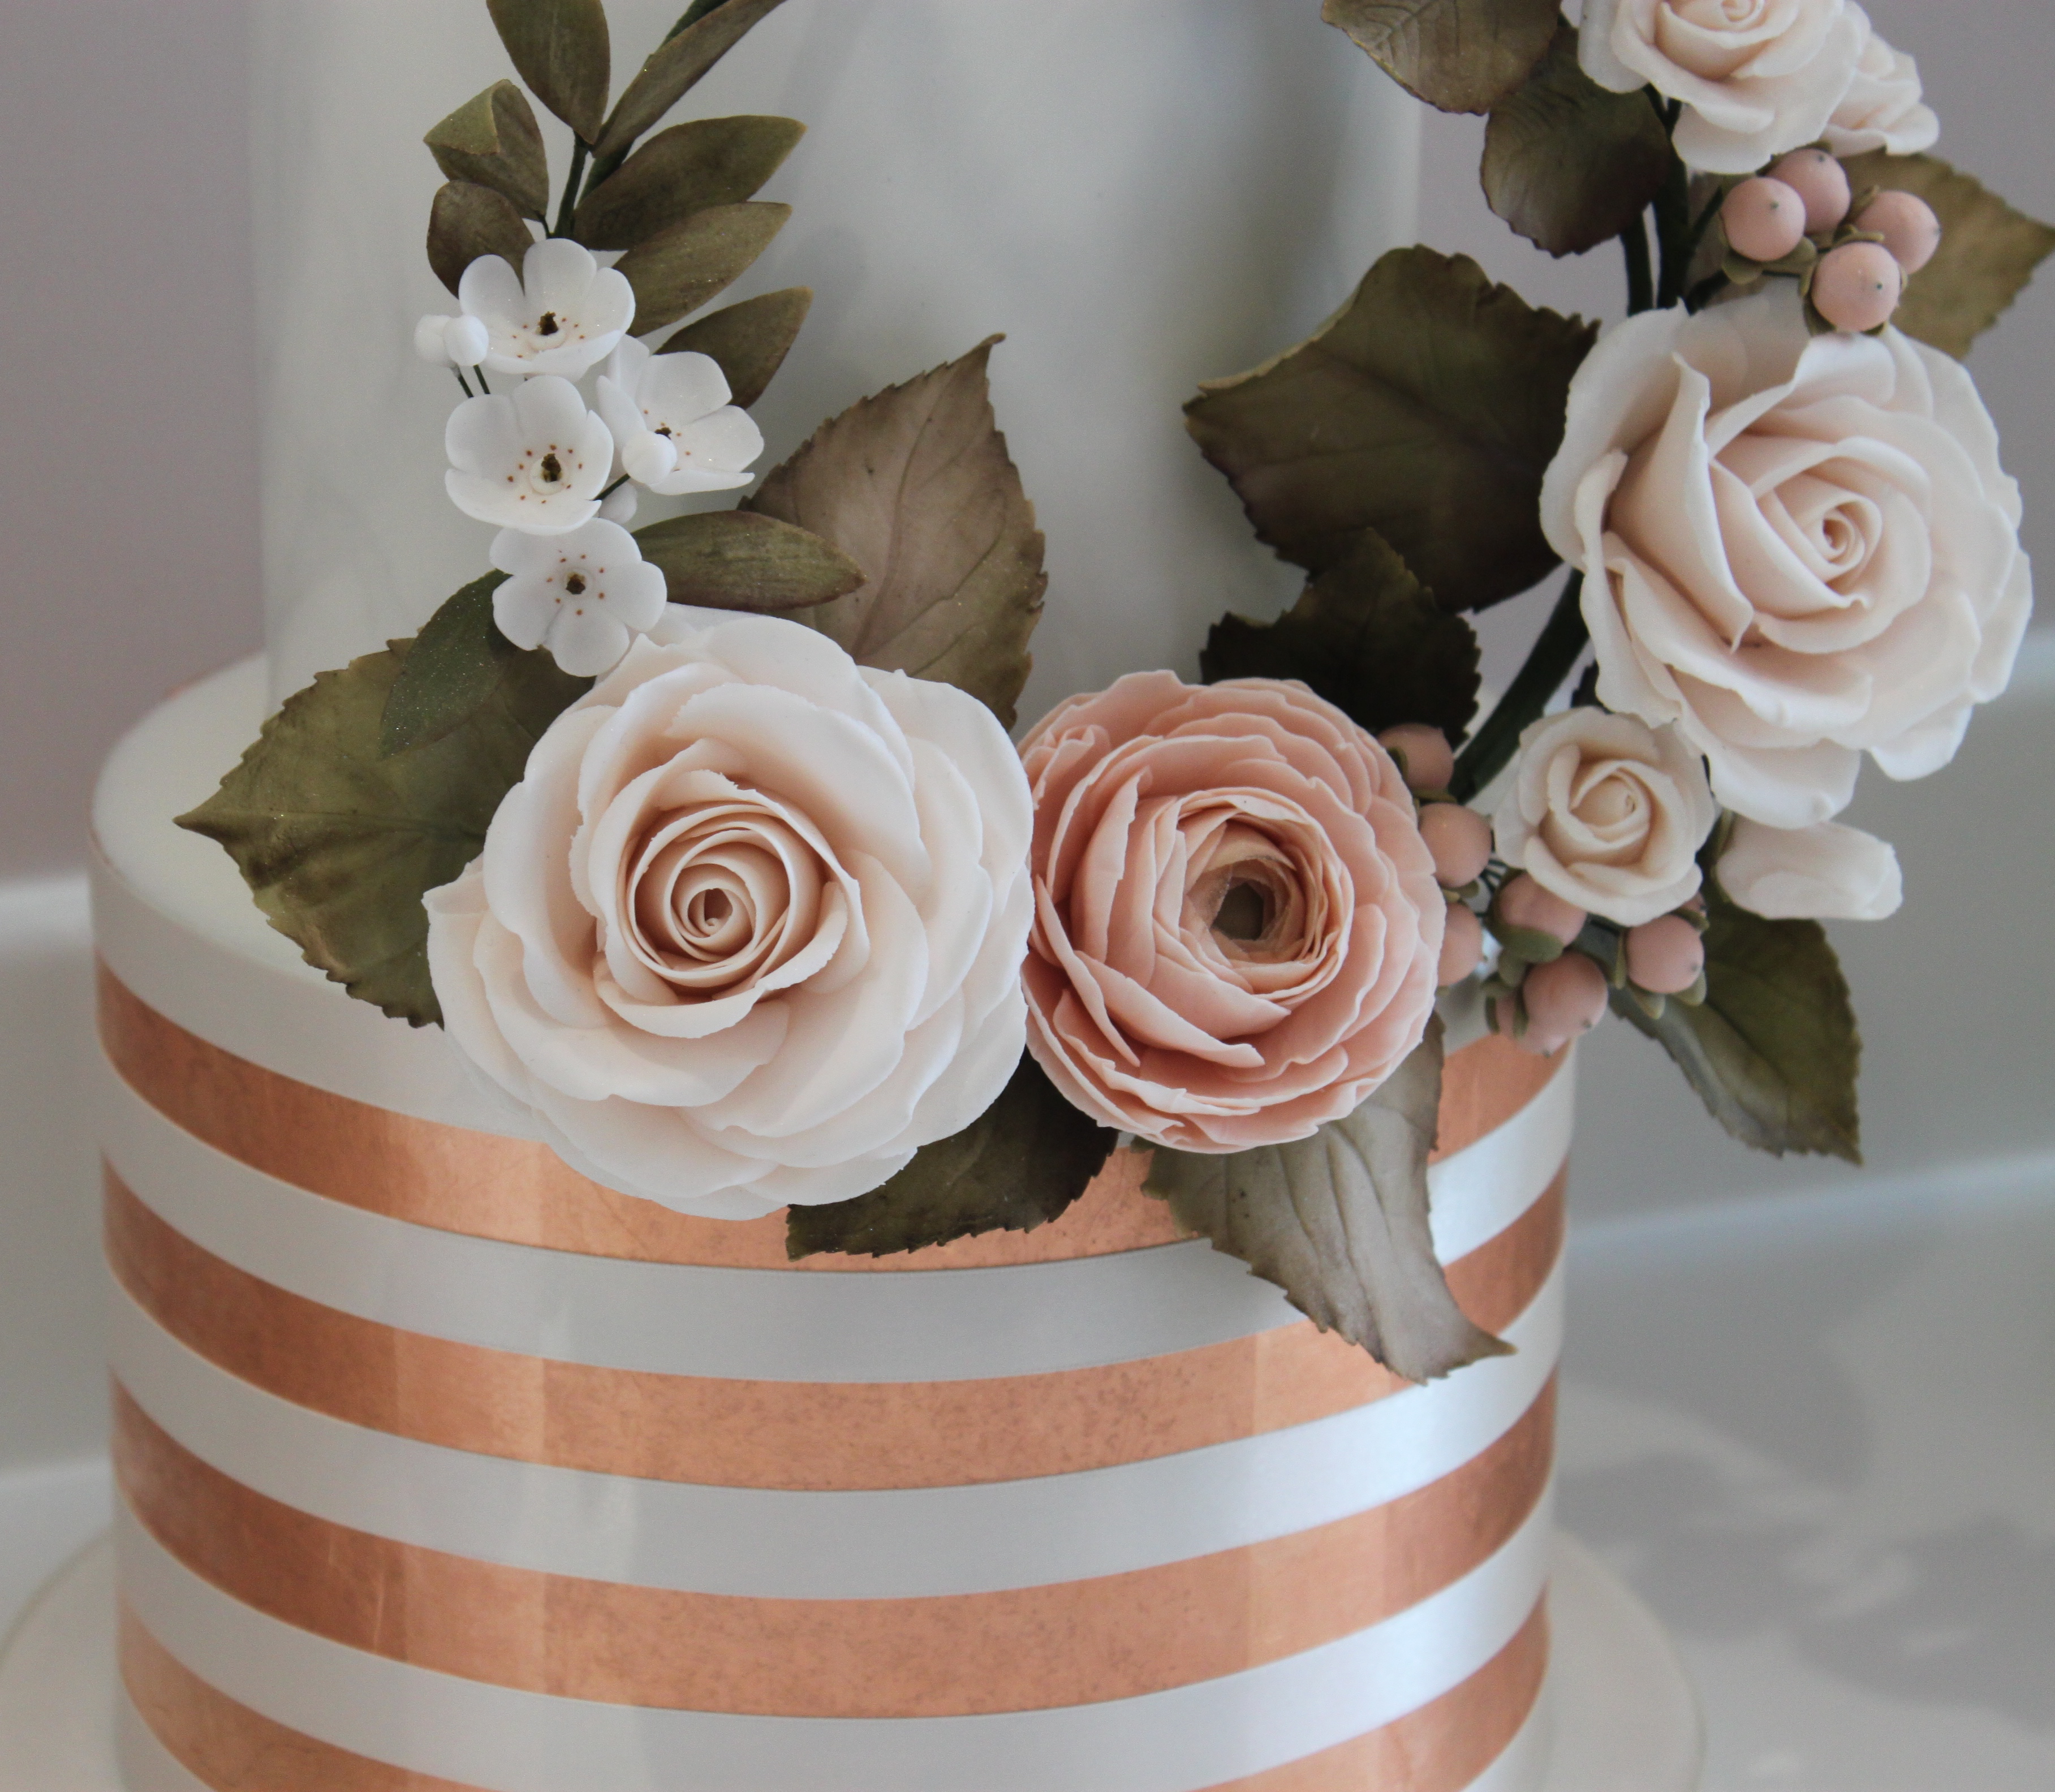 Fondant Cake Design